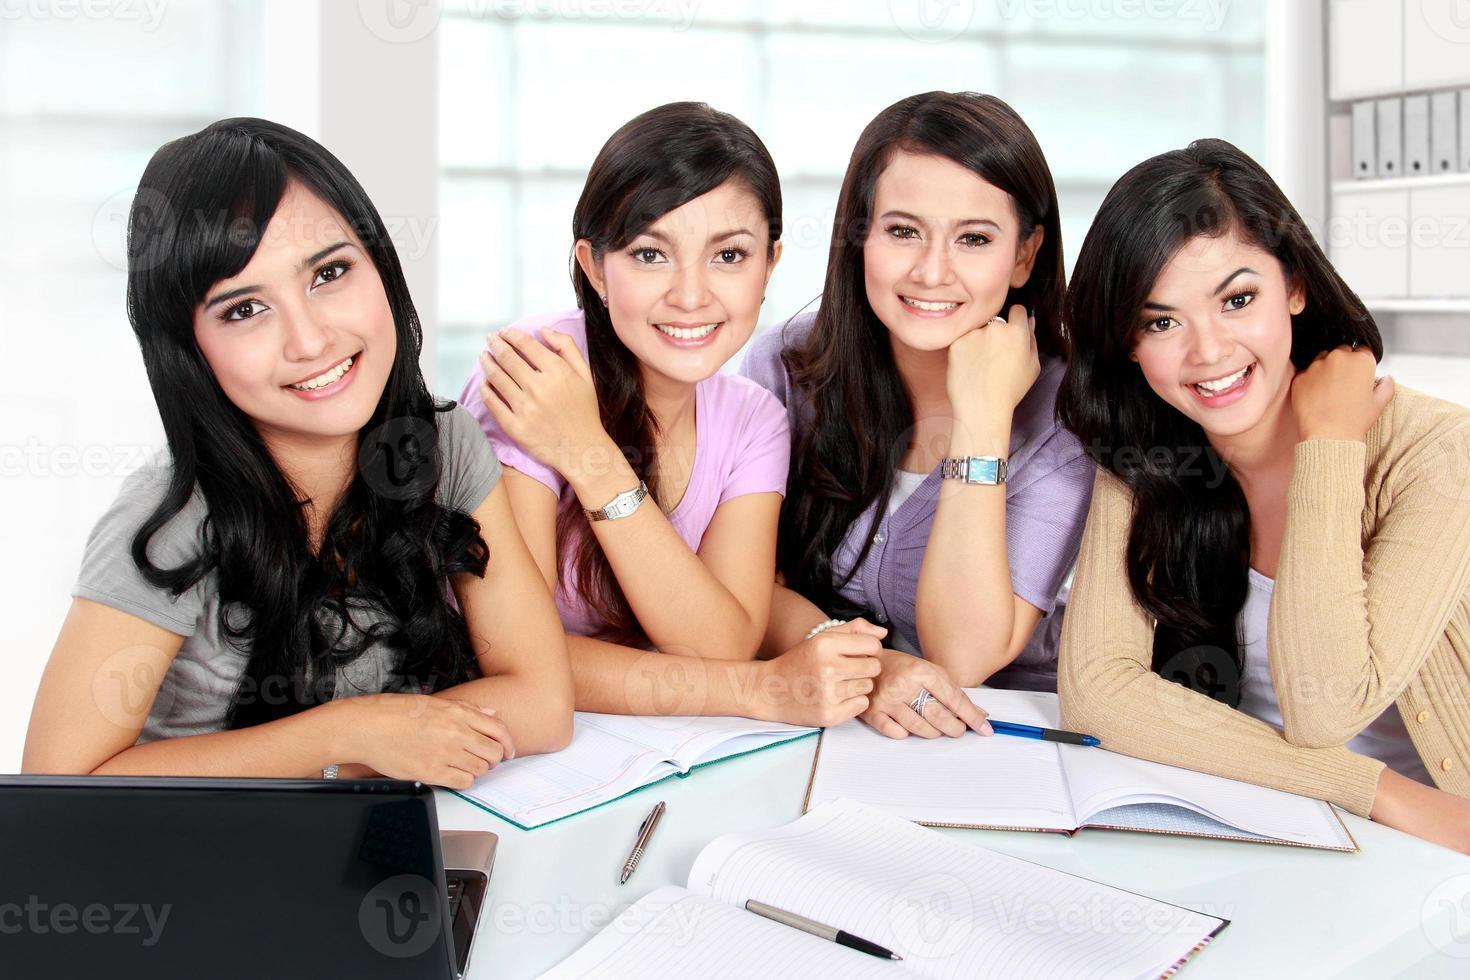 grupo de estudiantes que estudian juntos foto